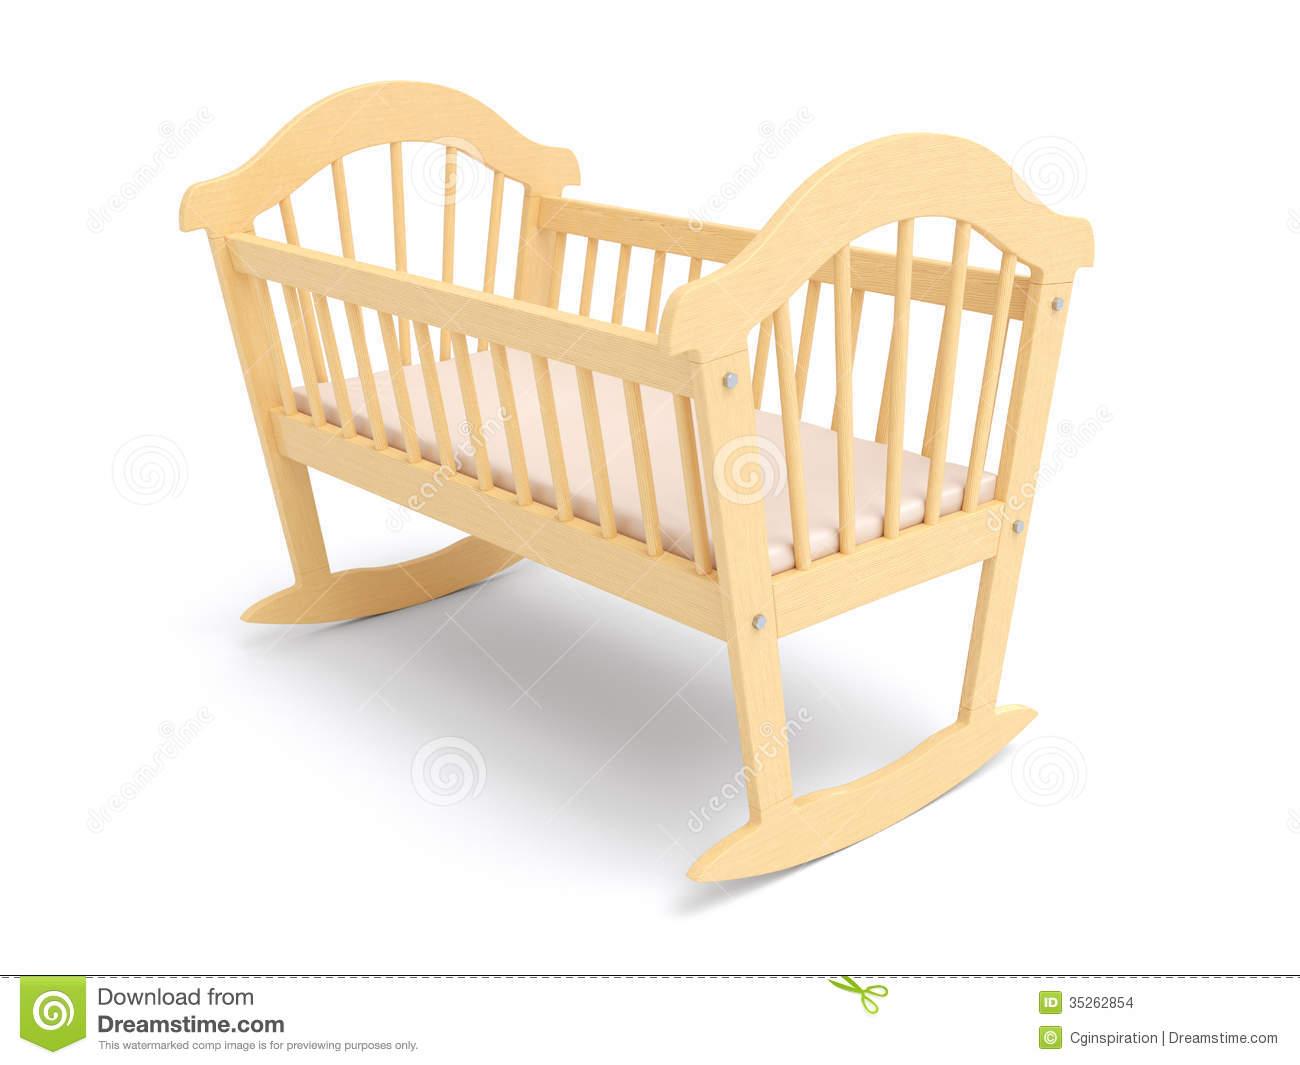 Crib clipart. Tierra este